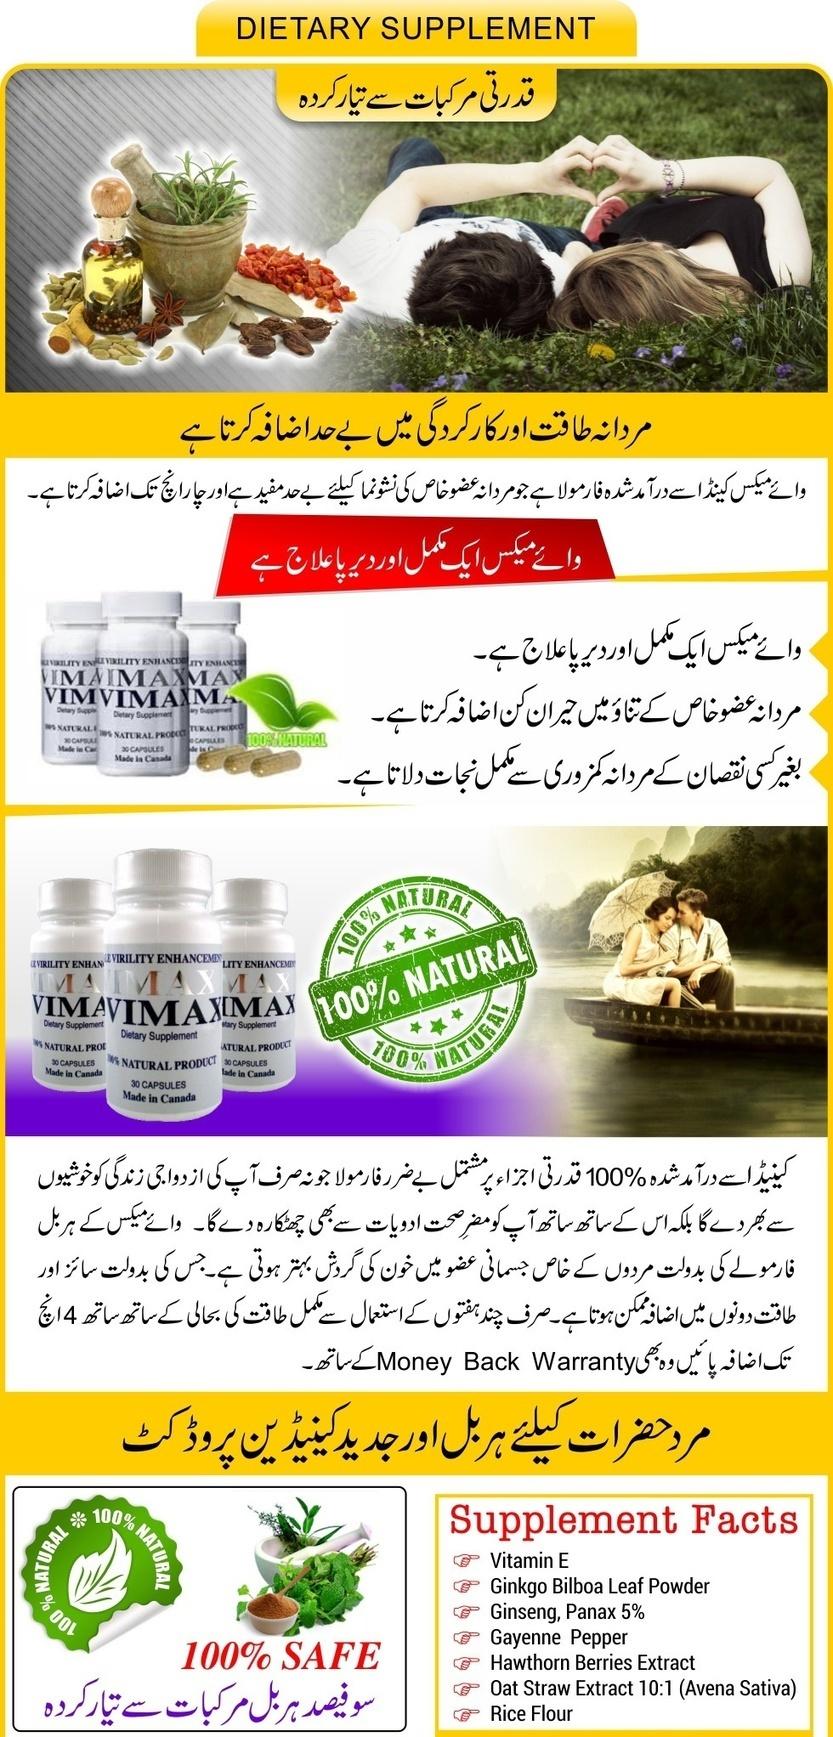 Vimax Price In Pakistan Buy Red Pakist Obat Pembesar Alat Vital Herbal Klg Pil Original